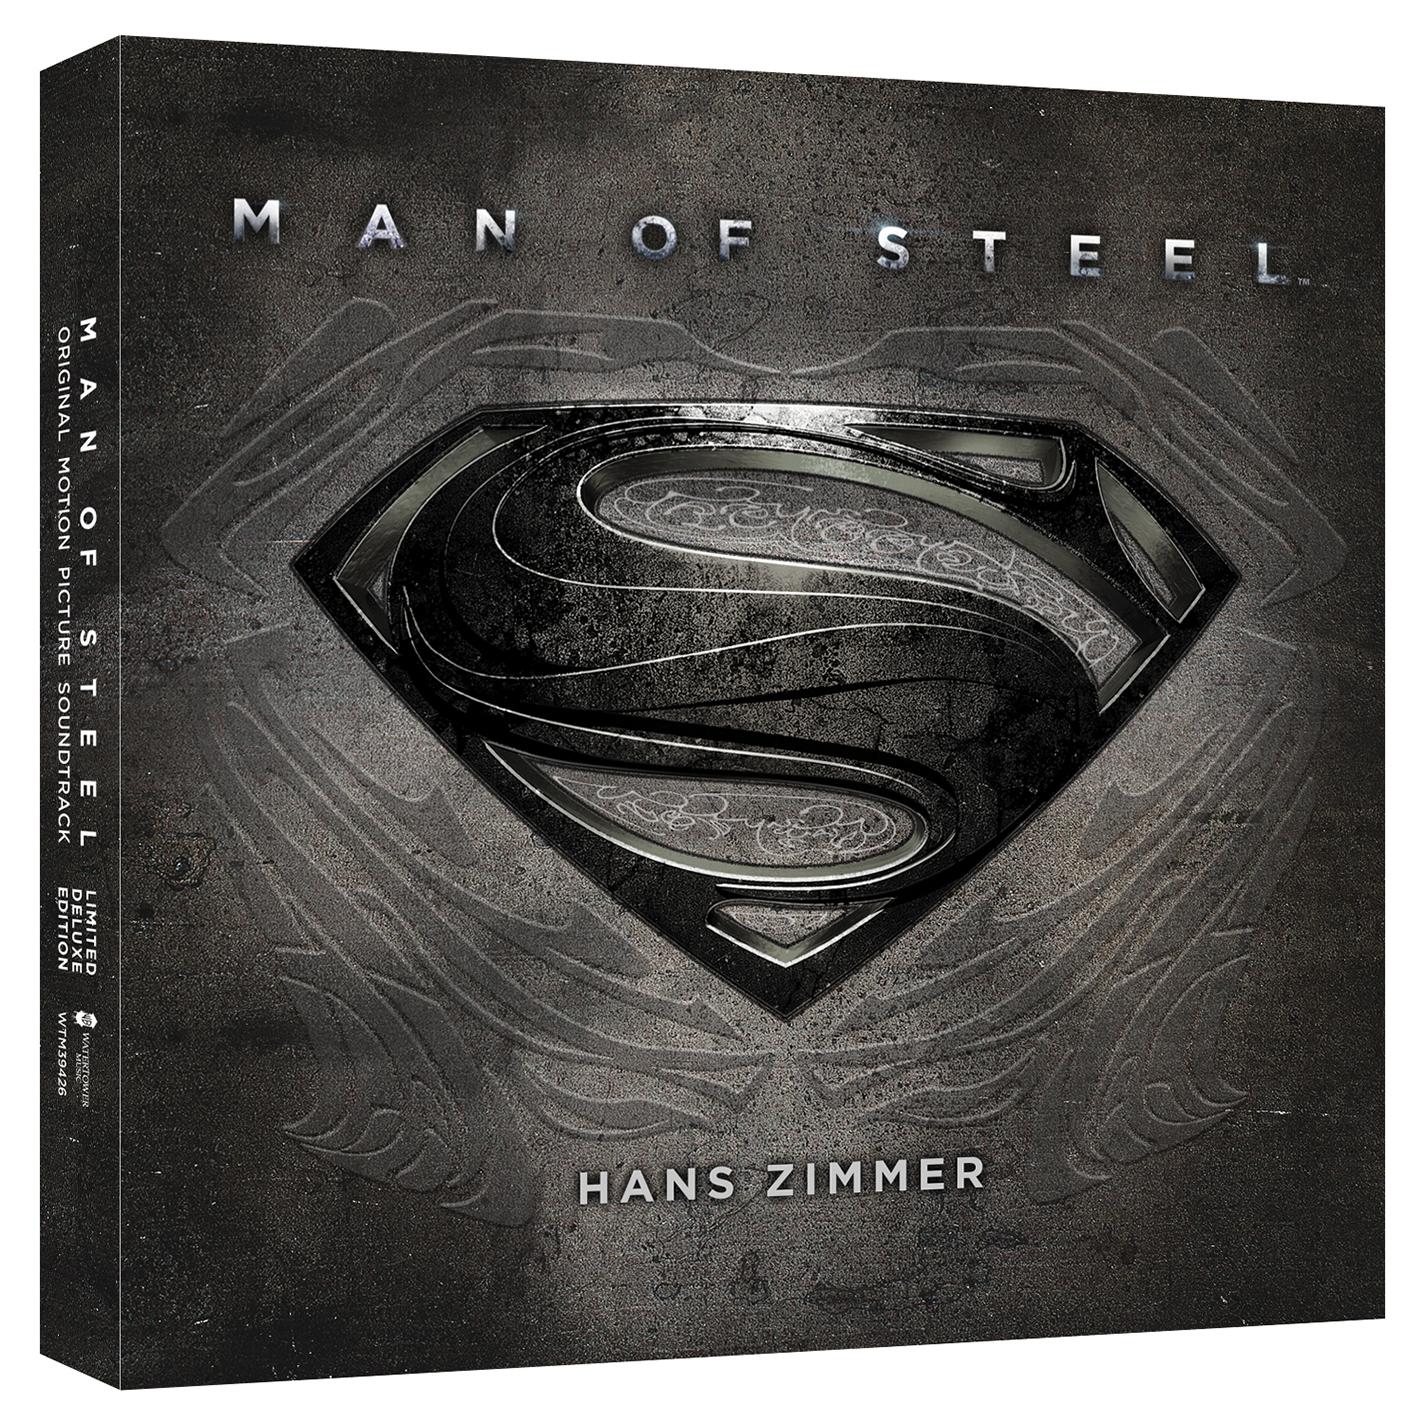 Hans zimmer » 2013 • man of steel ♬ index of …/hans zimmer/2013.